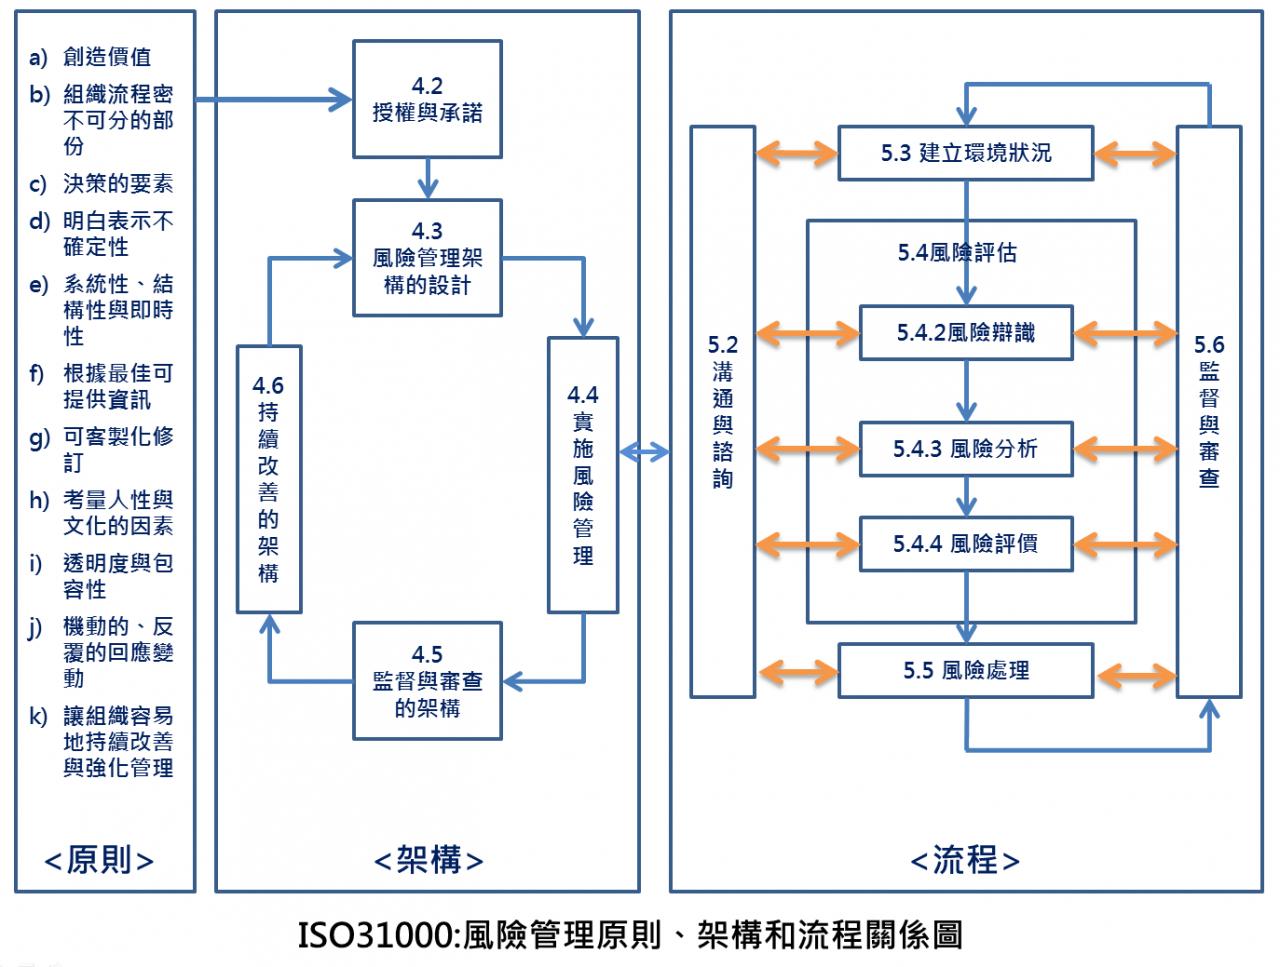 ISO31000 風險管理框架